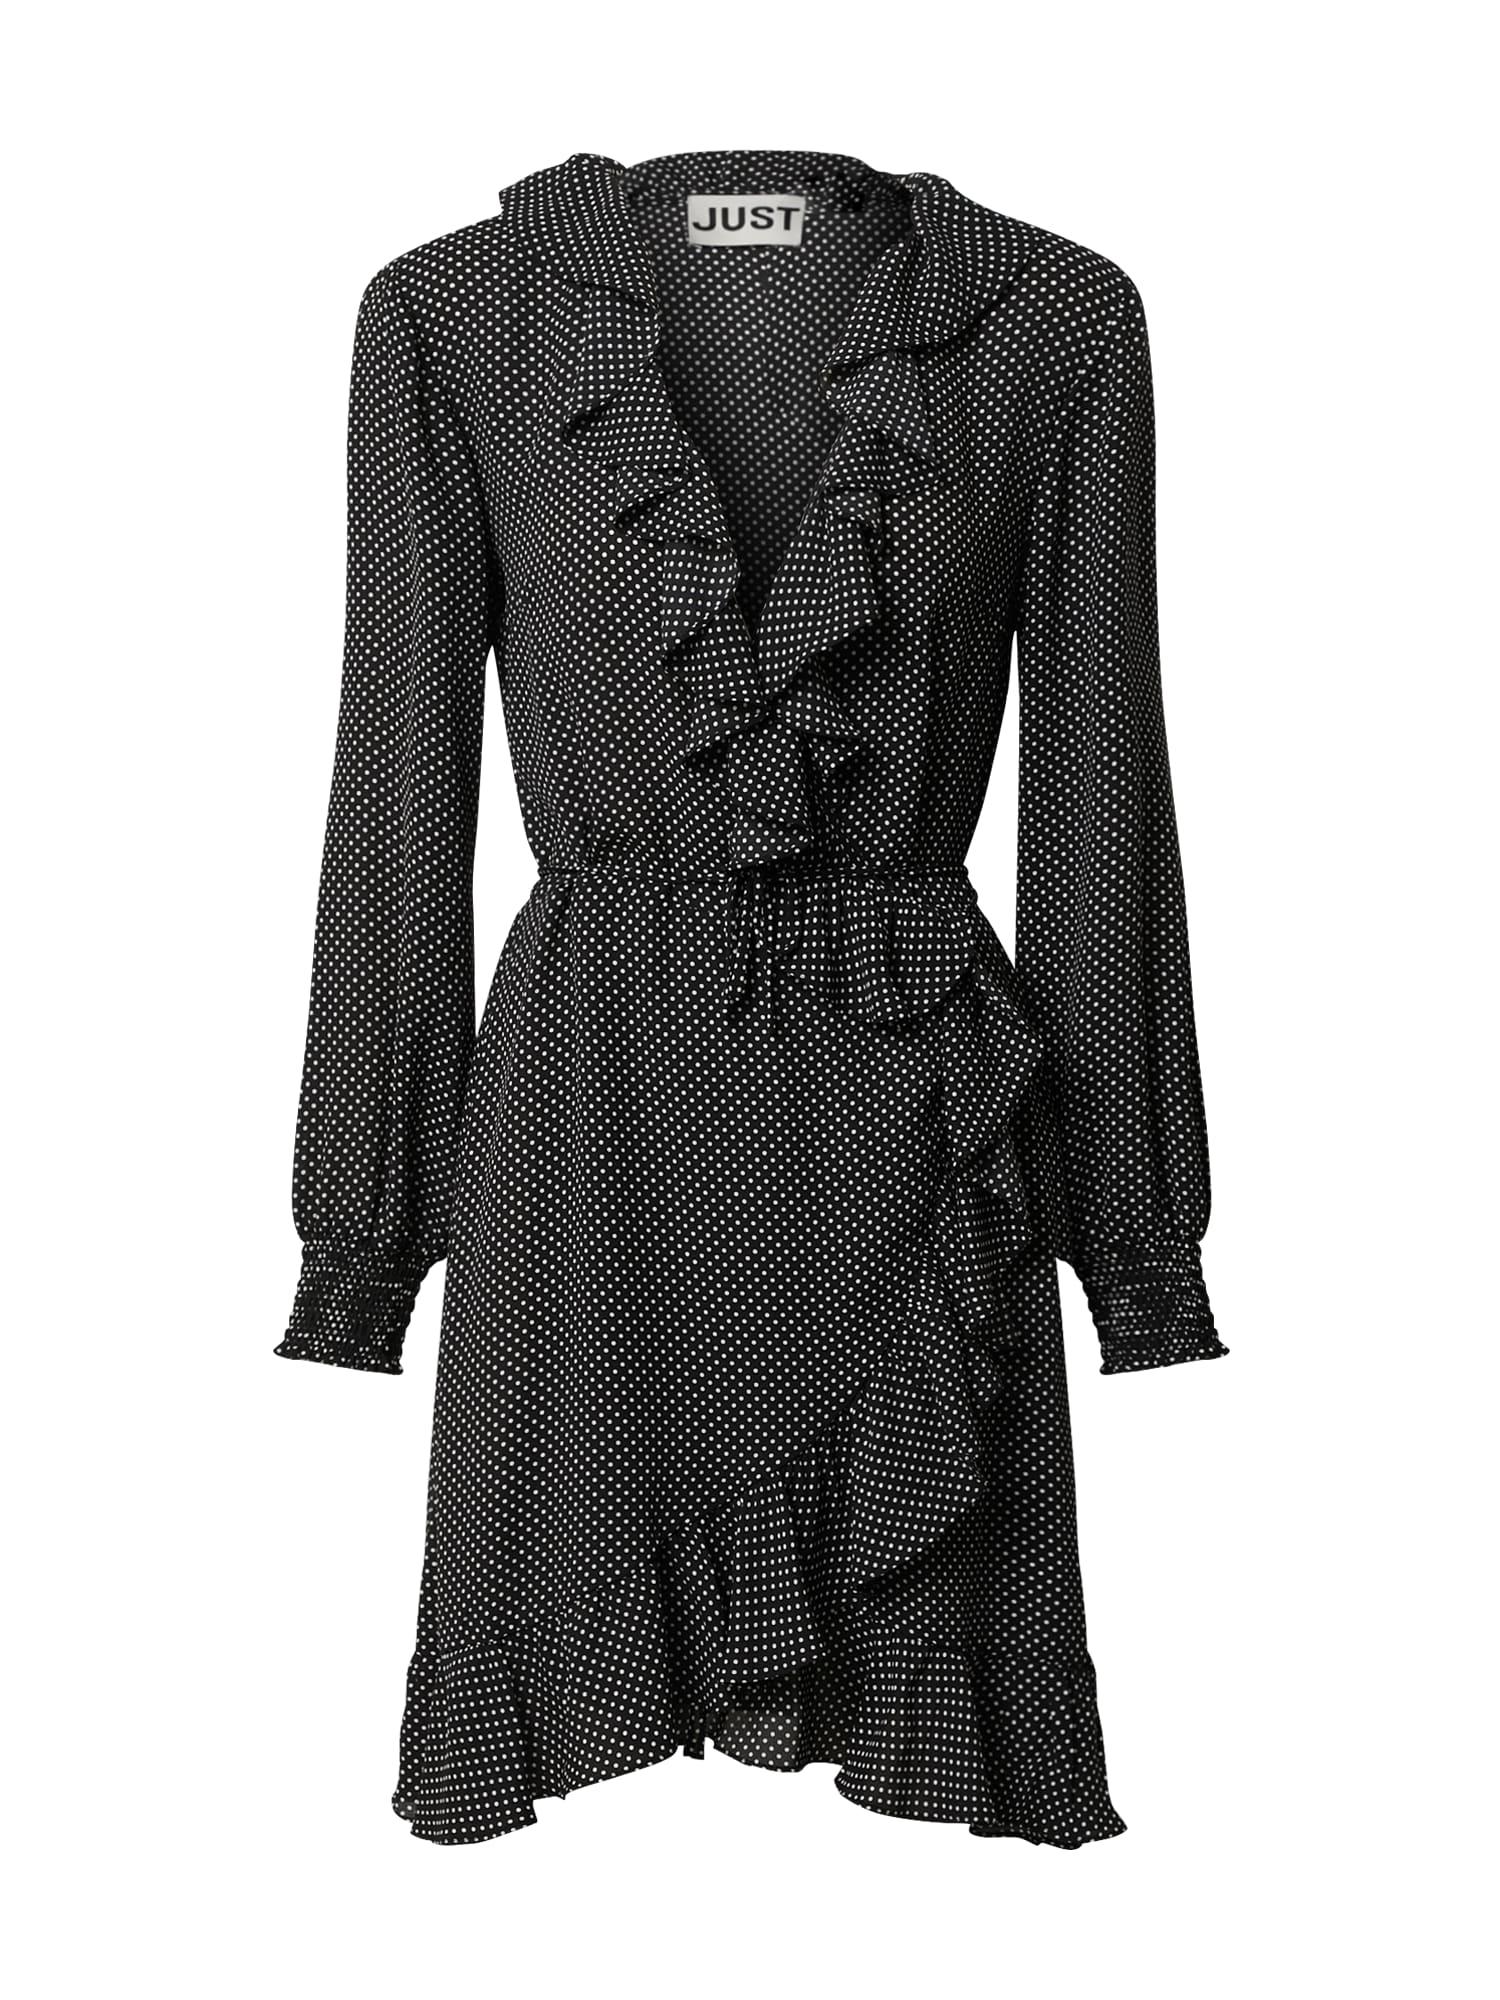 JUST FEMALE Suknelė balta / juoda